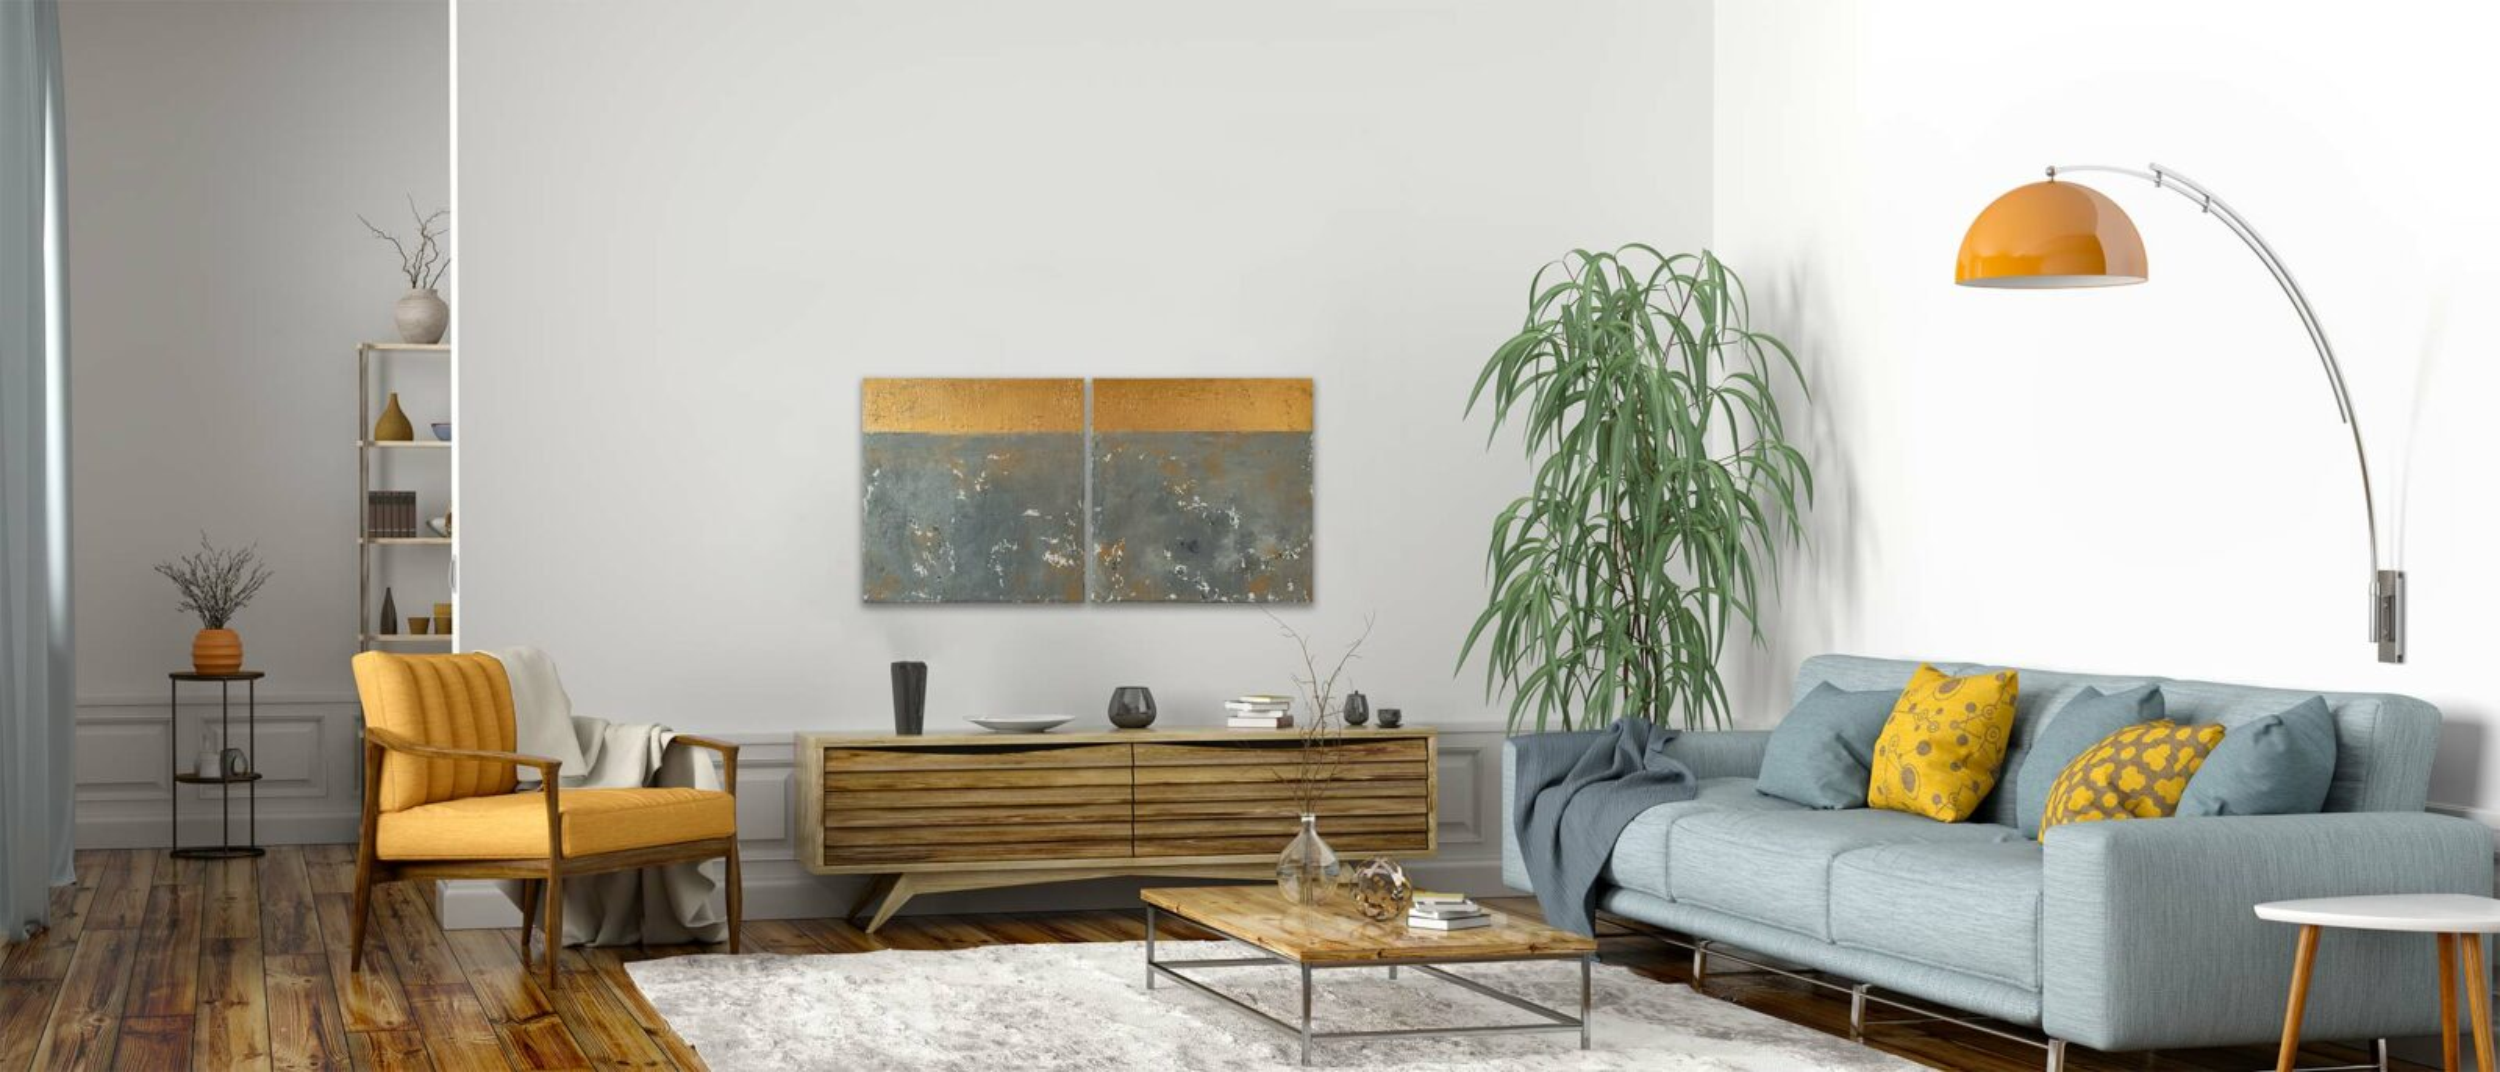 "2er-Set abstraktes Acryl Gemälde - ""LOFT II"" Unikat (248)"